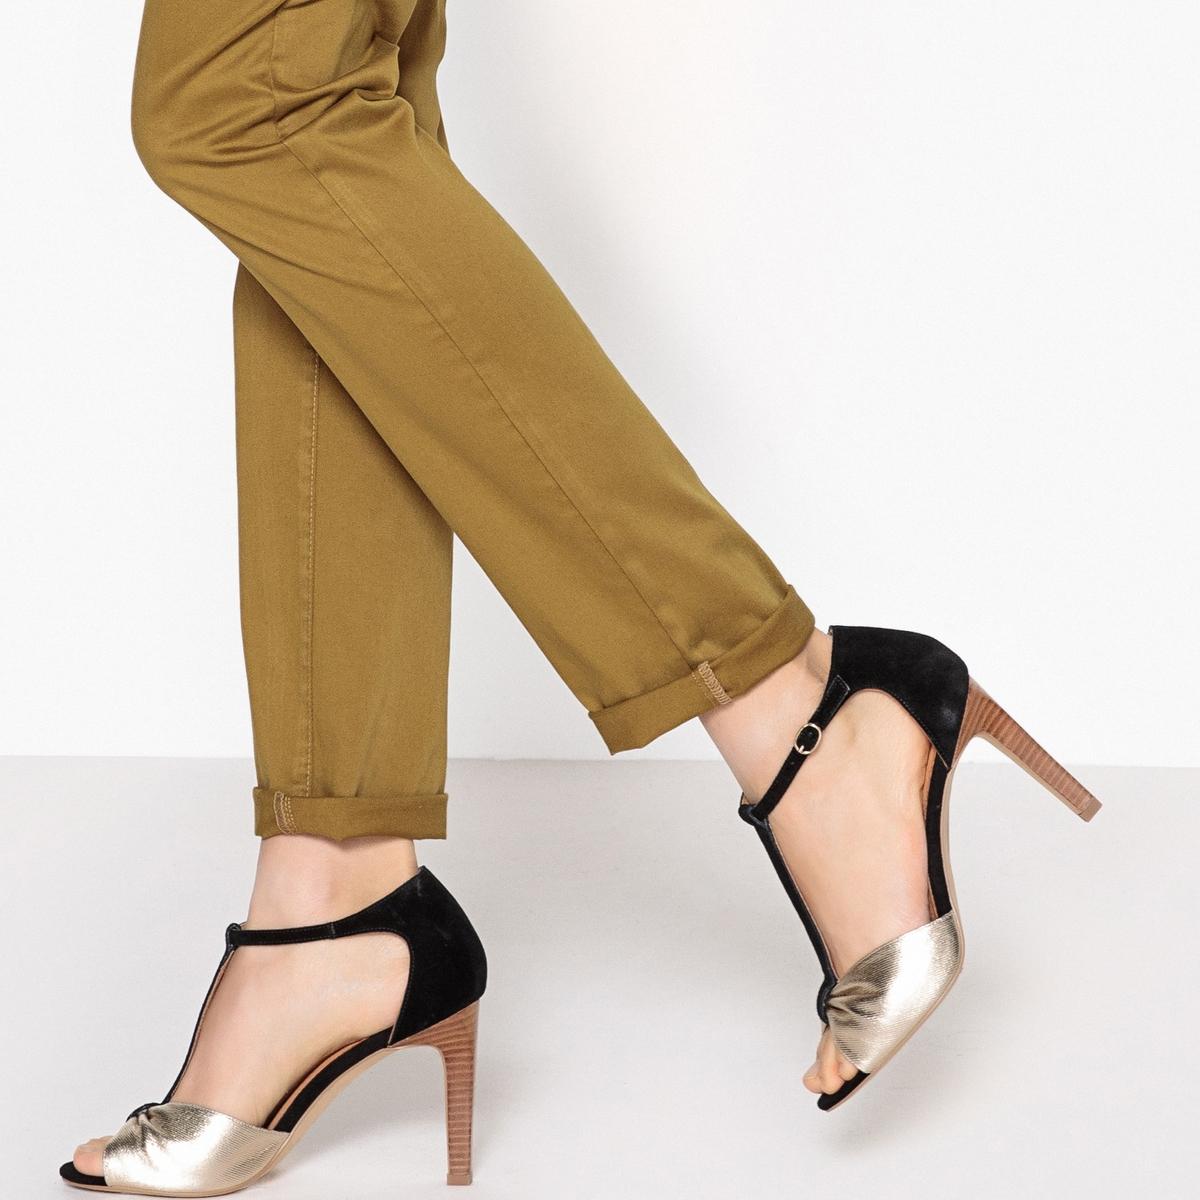 Sandalias de piel con banda dorada